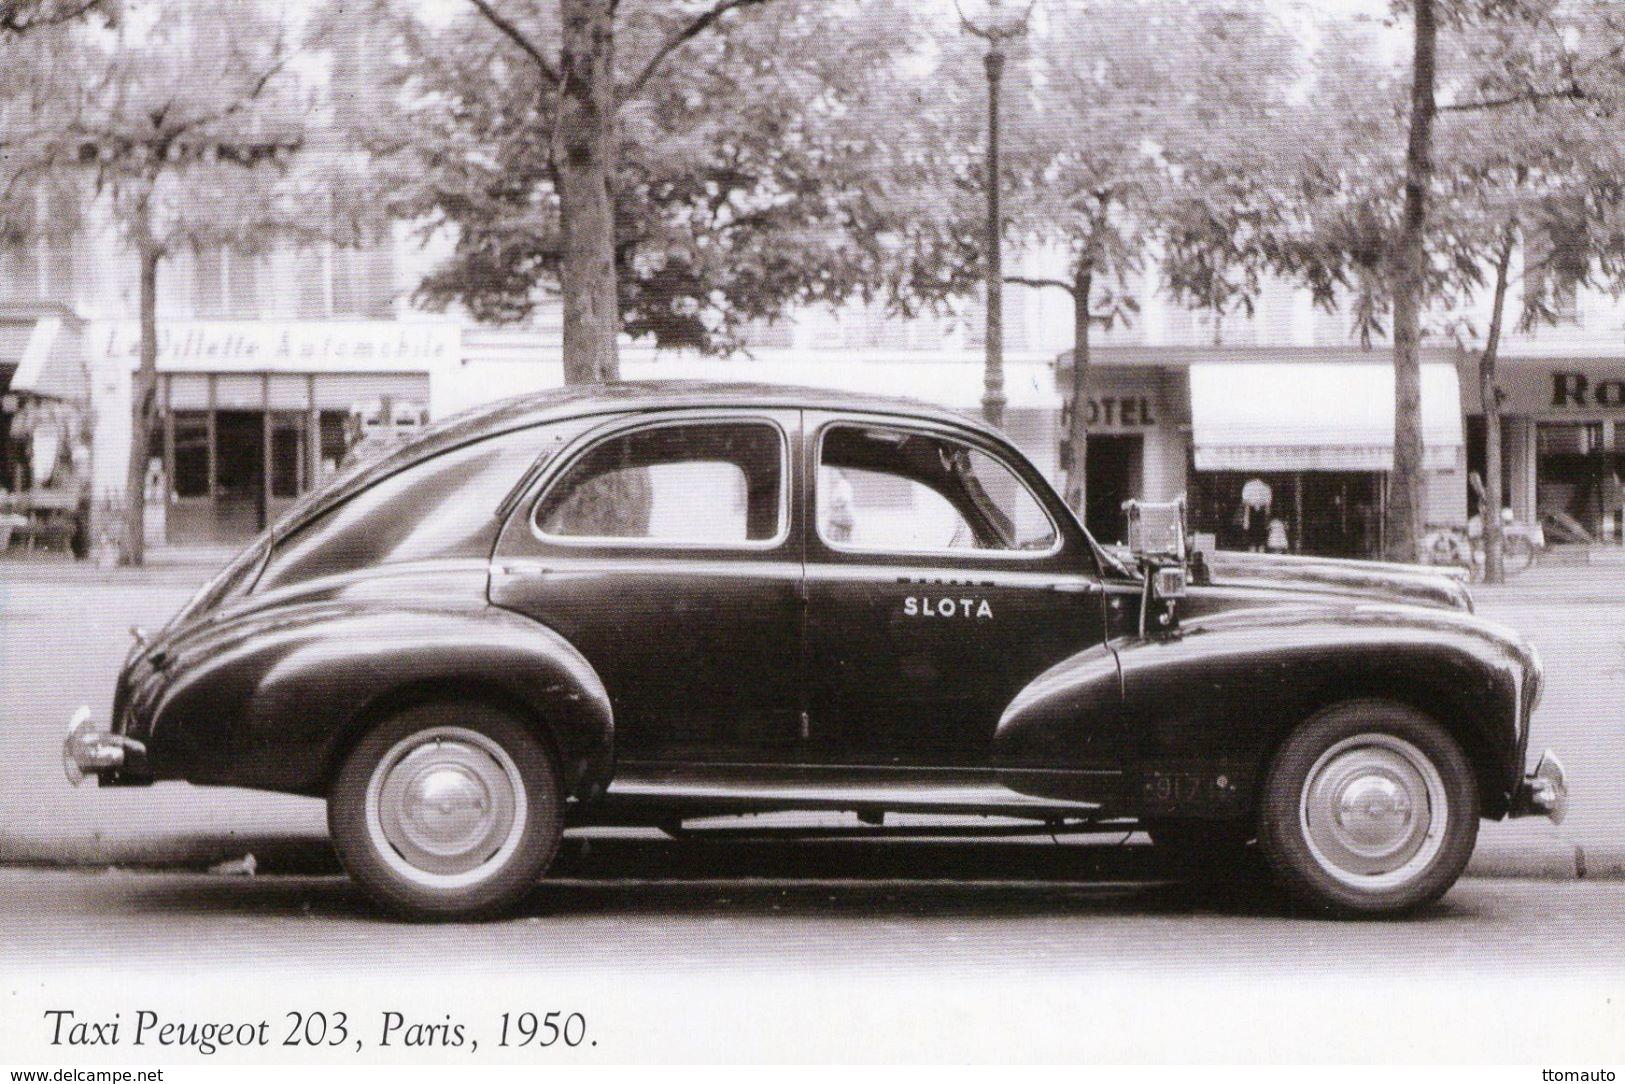 Taxi  -  Peugeot 203  -  SLOTA  -  Paris  -  1950  -  CPM - Taxis & Droschken